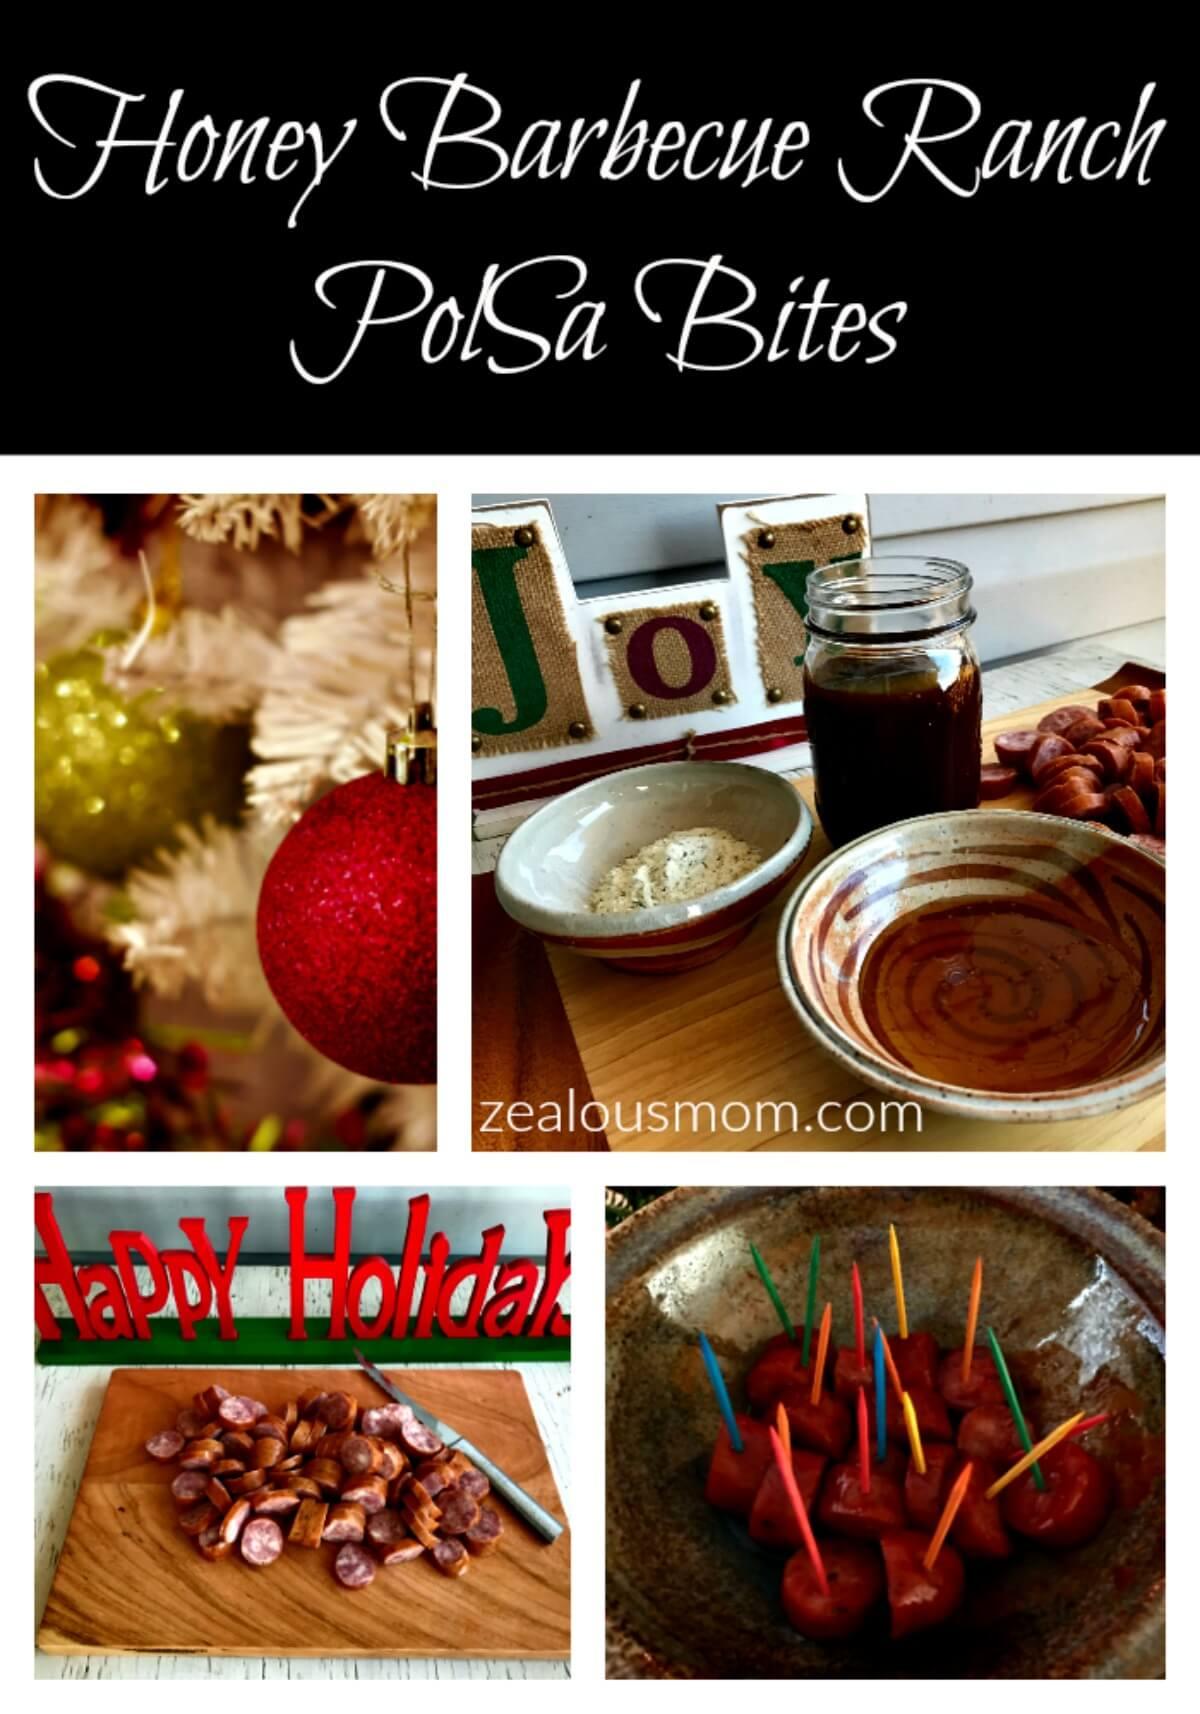 Honey Barbecue Ranch PolSa Bites